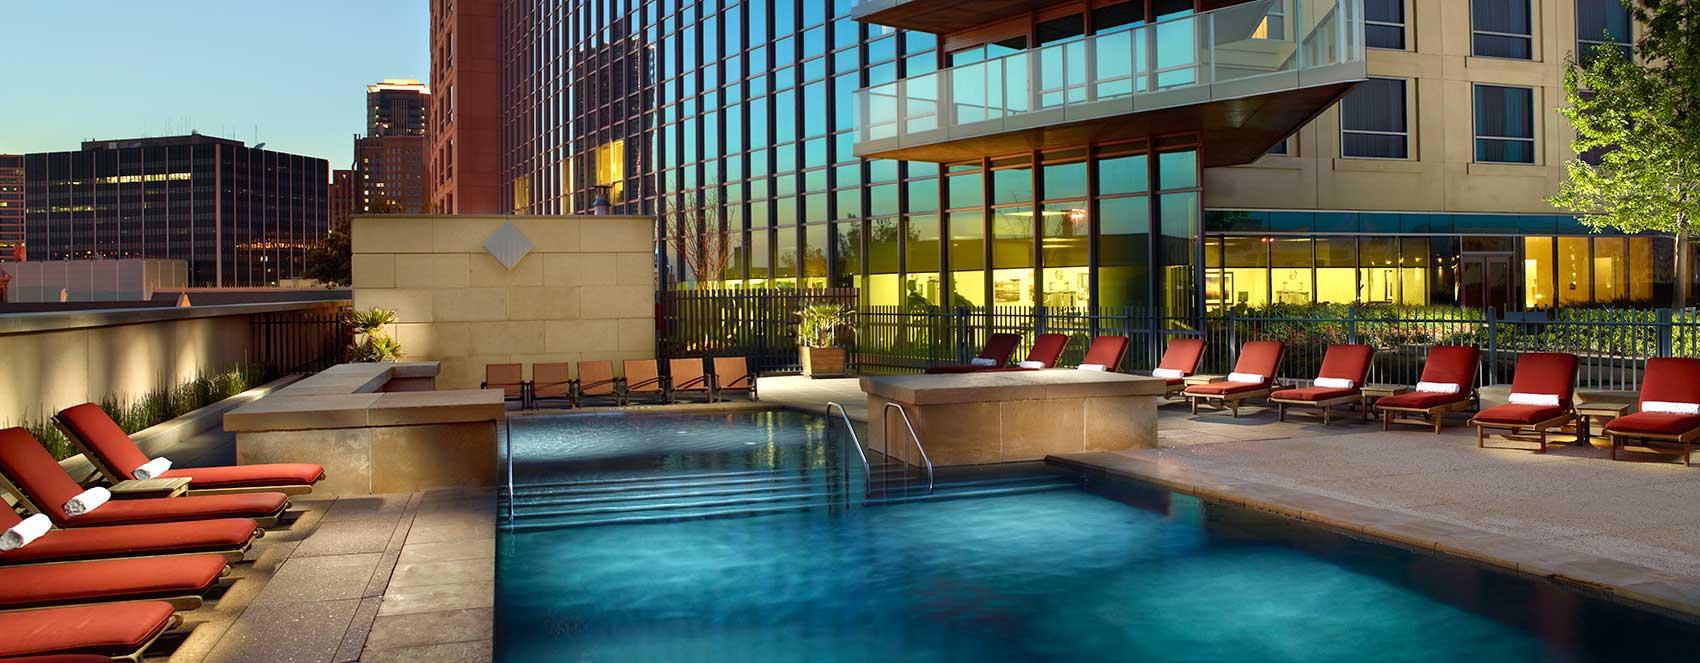 Downtown Fort Worth Hotel | Omni Fort Worth Hotel